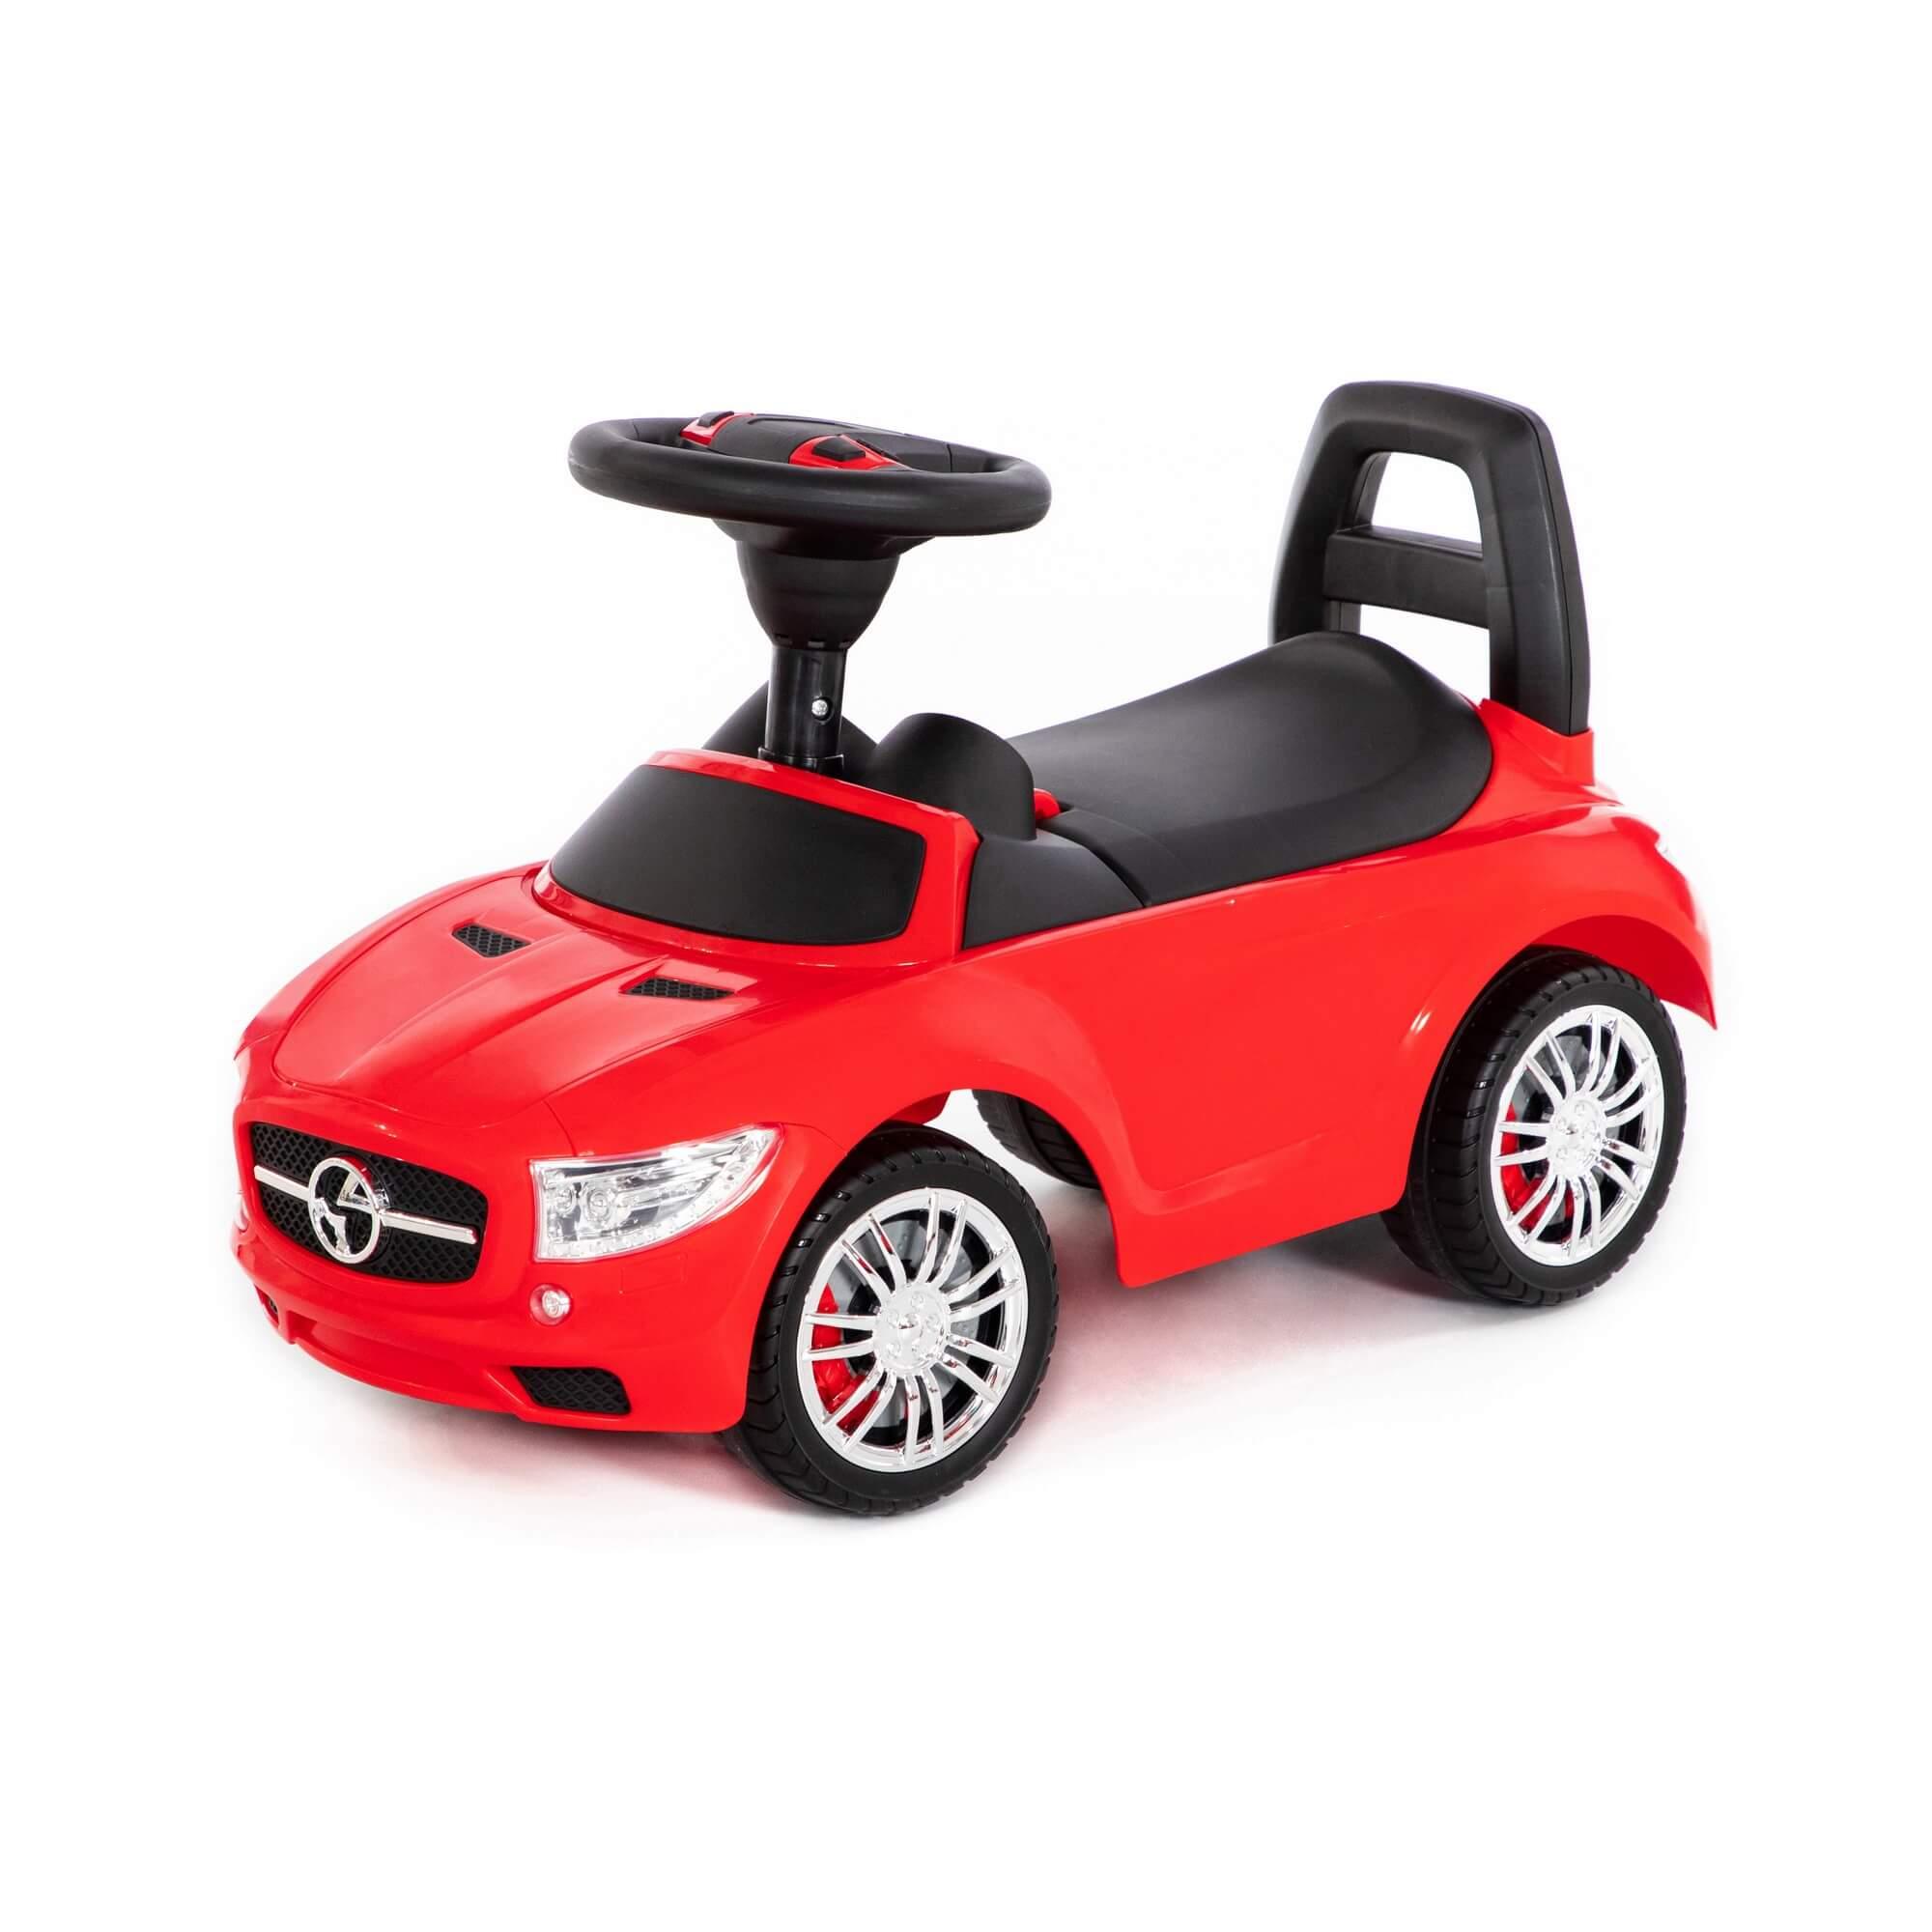 SuperCar sürümeli araba No:1 ses sinyali ile (pembe) Ref. 84460 - photo #1